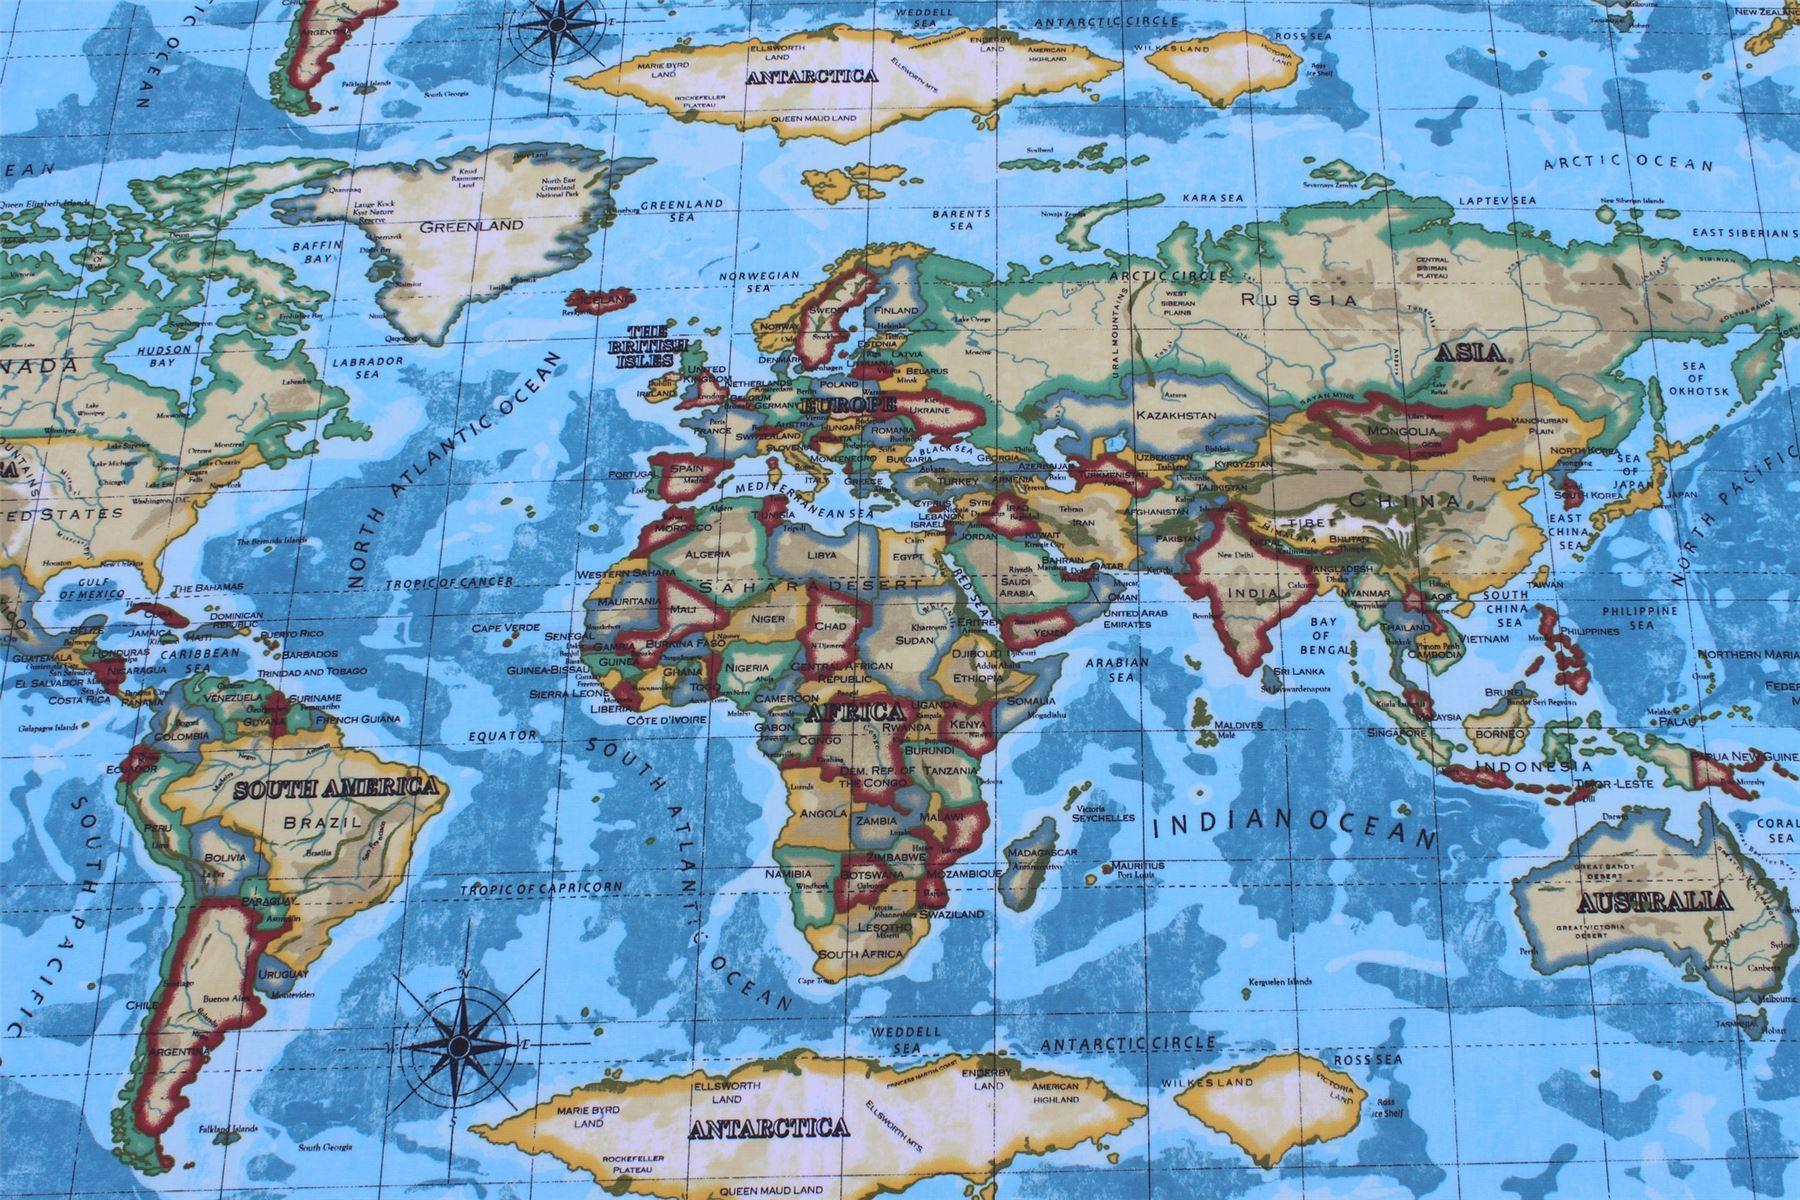 Designer pvc world atlas map vinyl wipe clean oilcloth prestigious designer pvc world atlas map vinyl wipe clean oilcloth prestigious tablecloth gumiabroncs Gallery